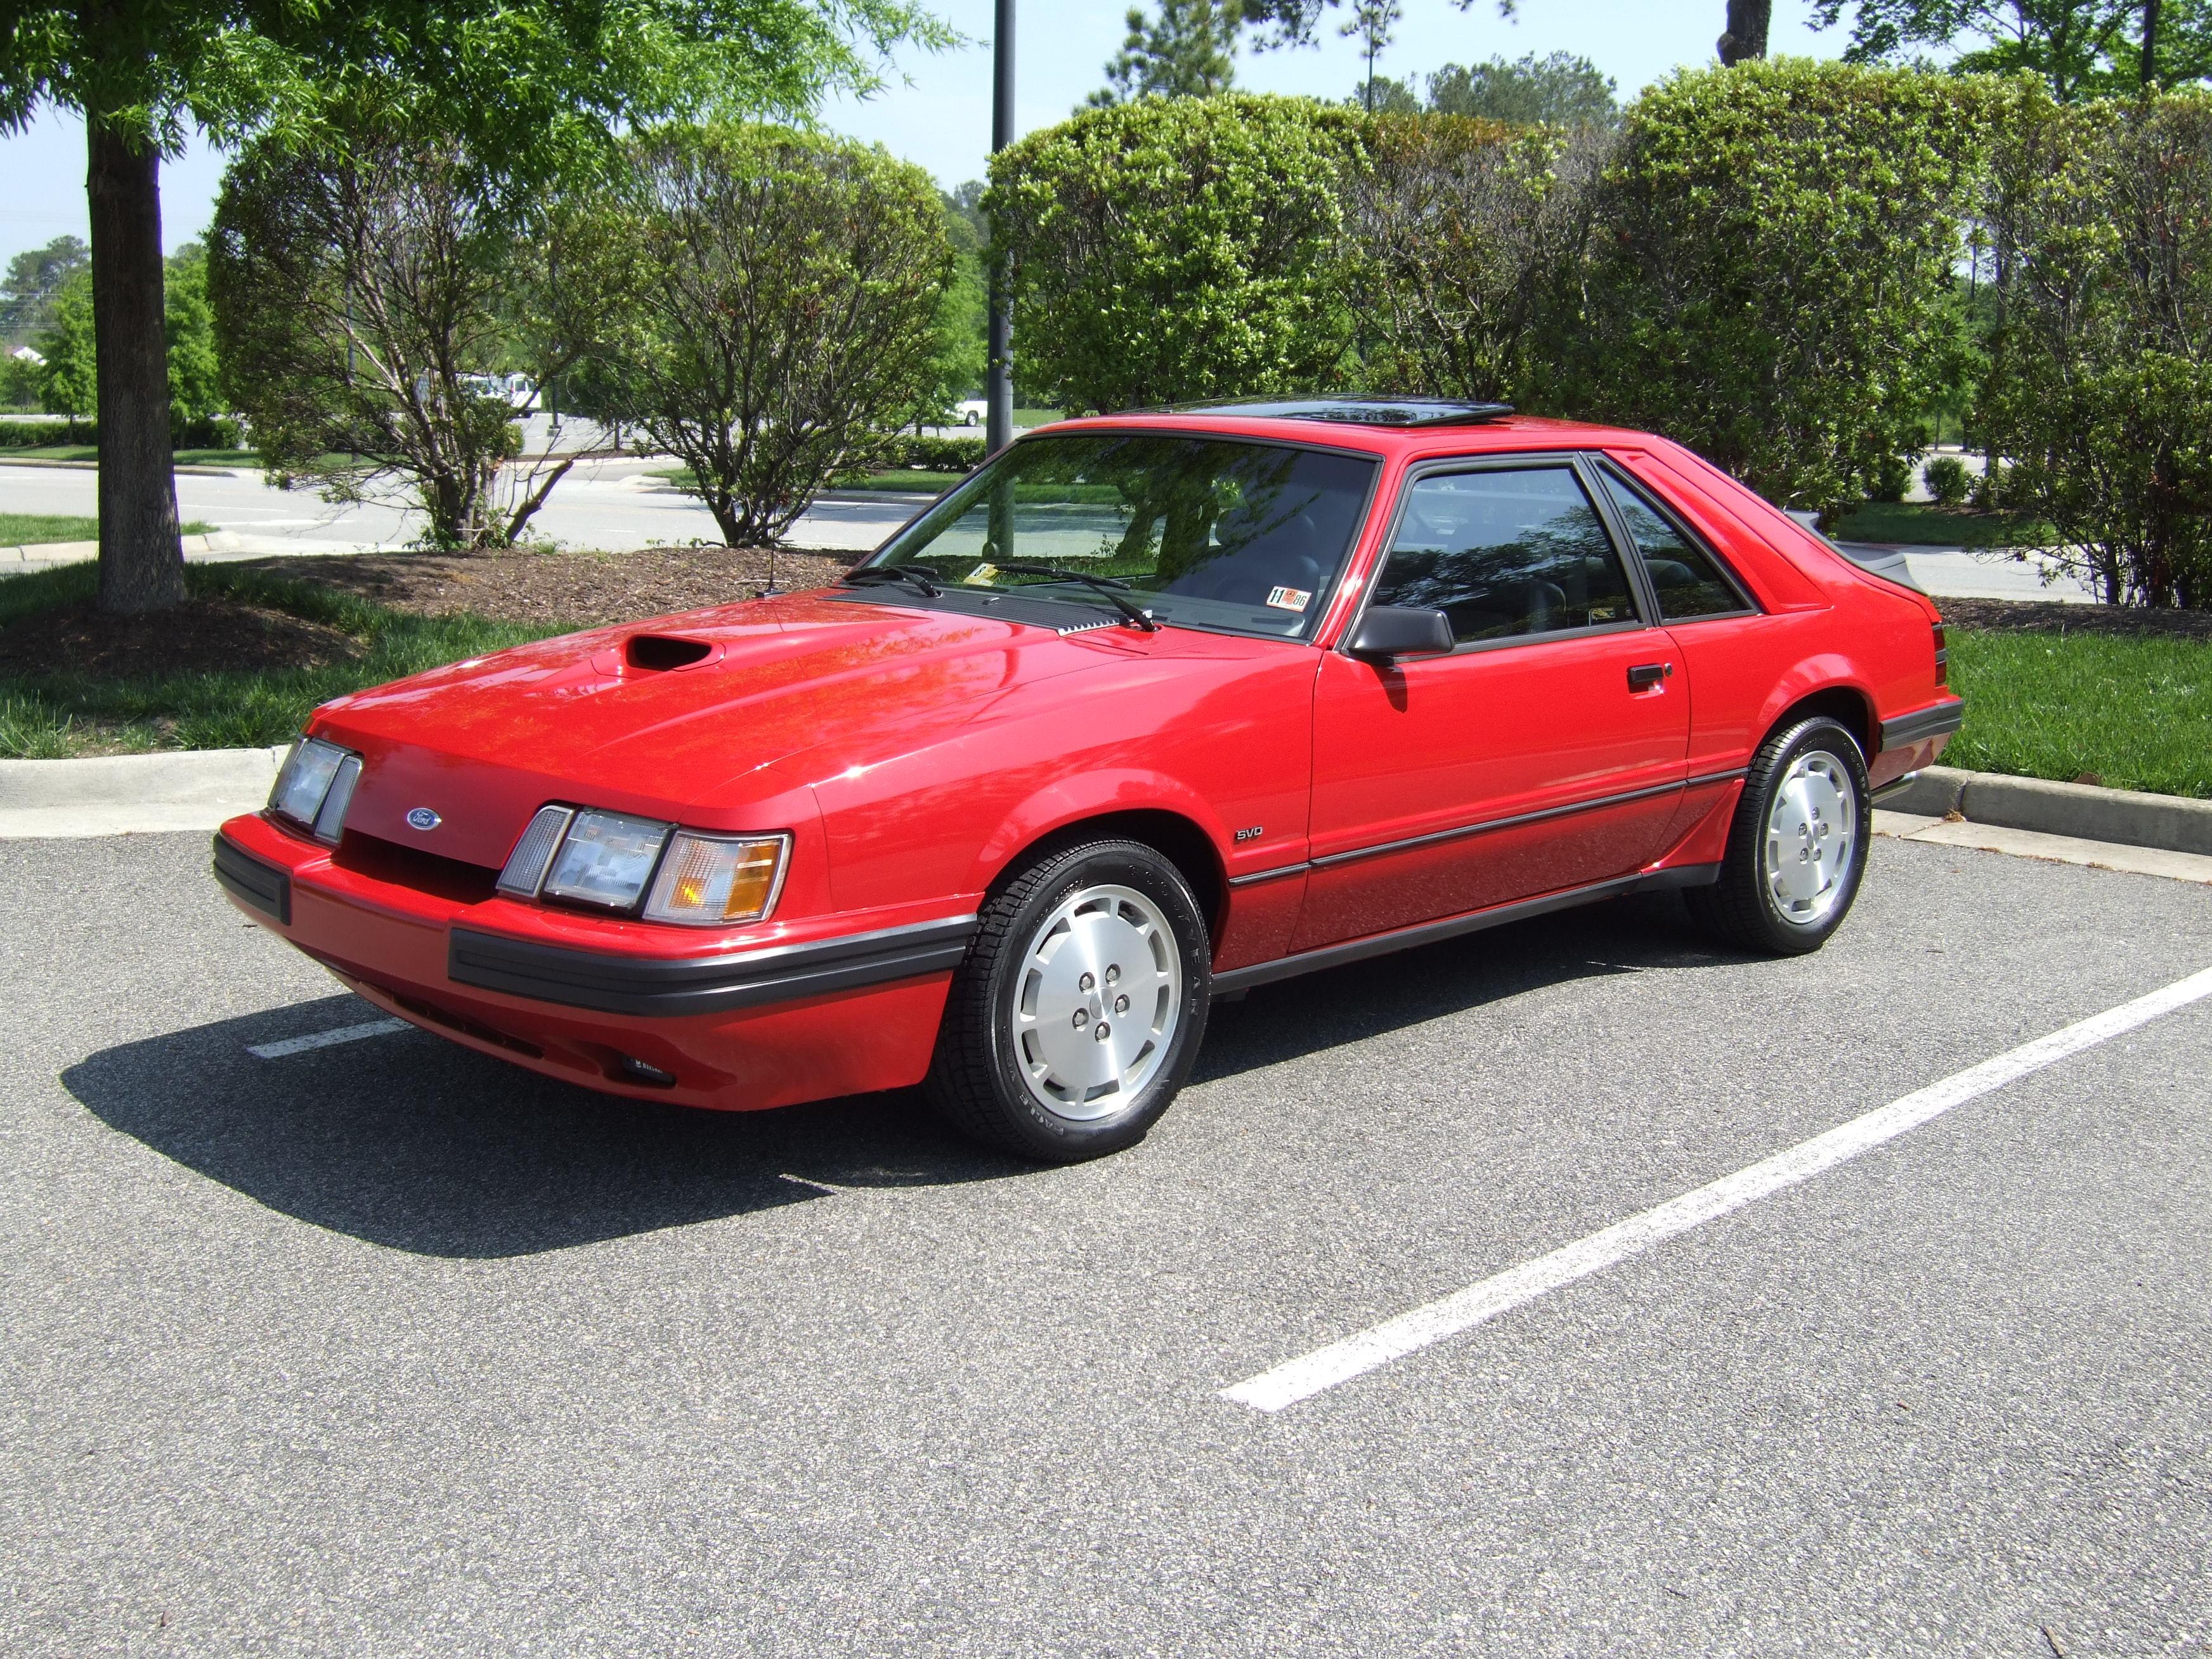 Mustang Svo Wheels 1986 Mustang Svo